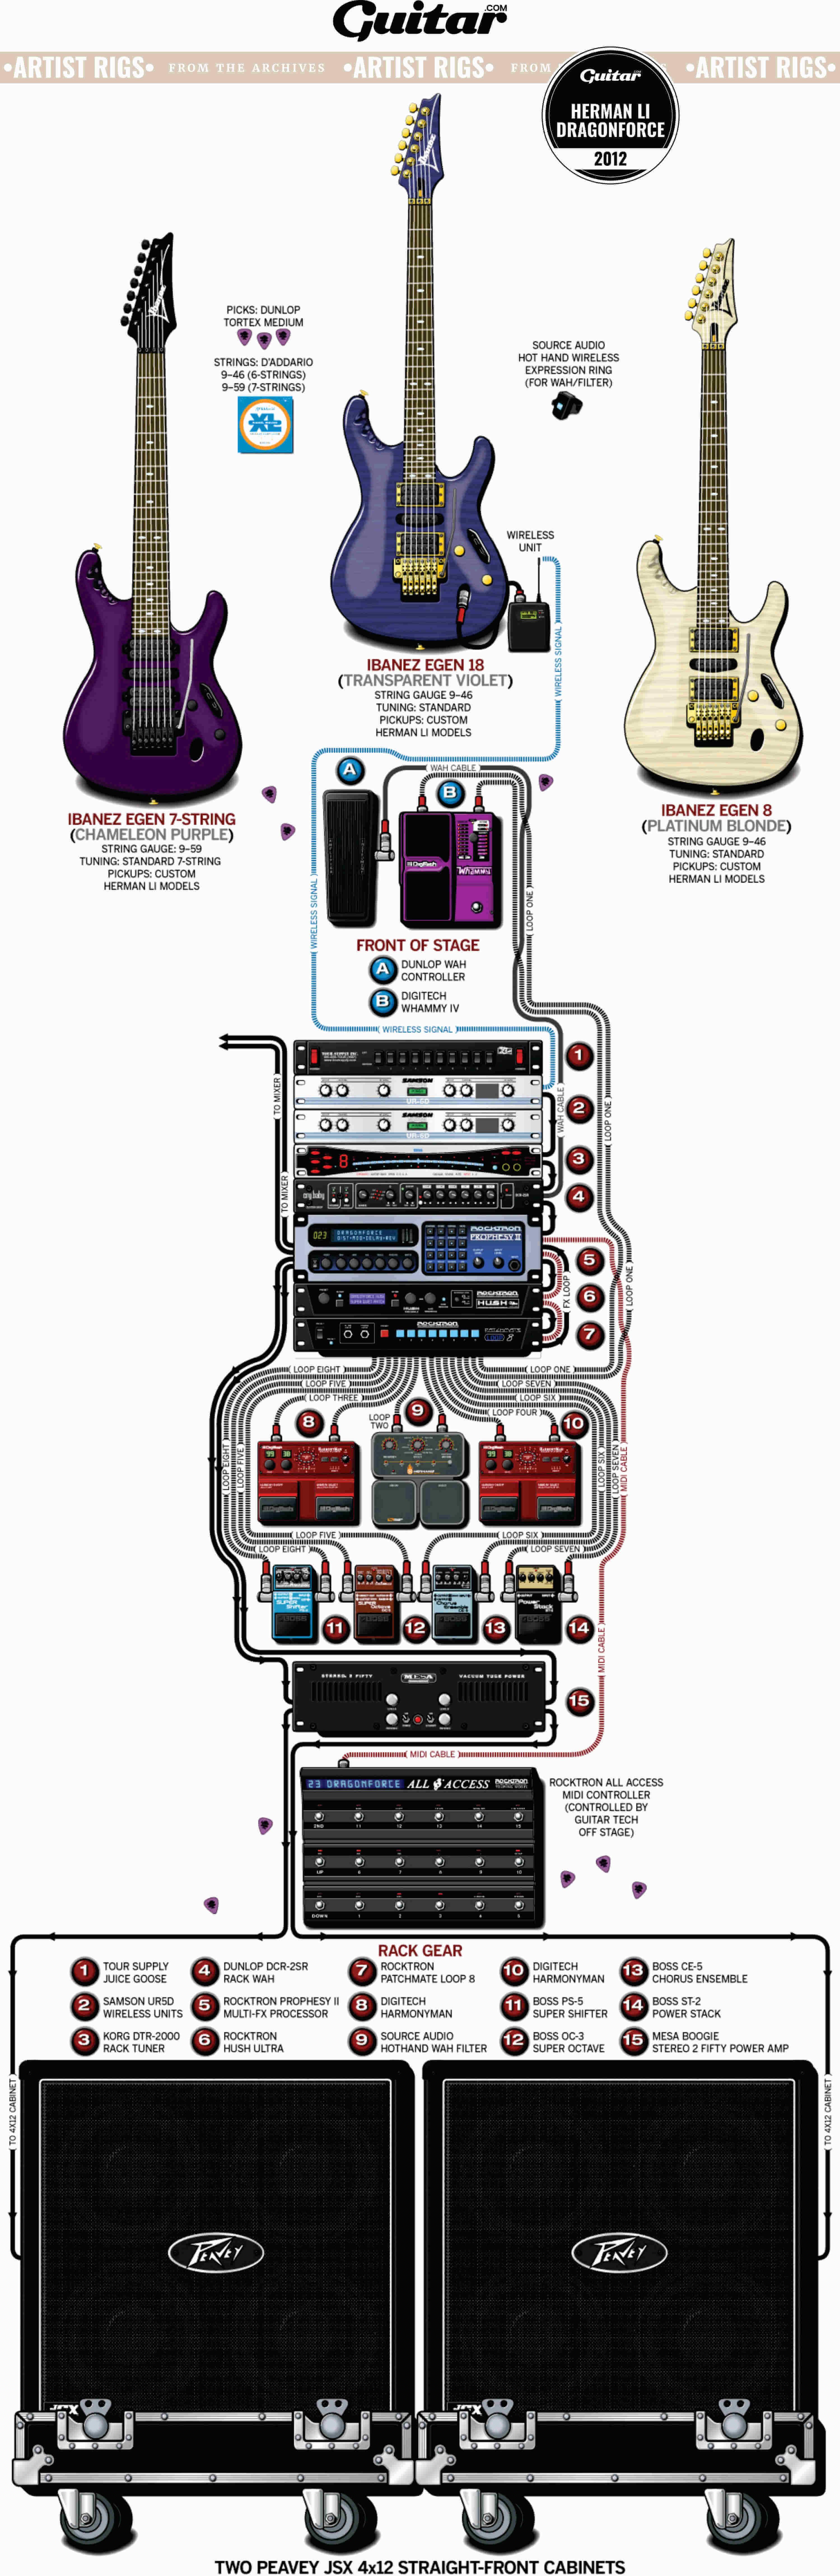 Rig Diagram: Herman Li, Dragonforce (2012)